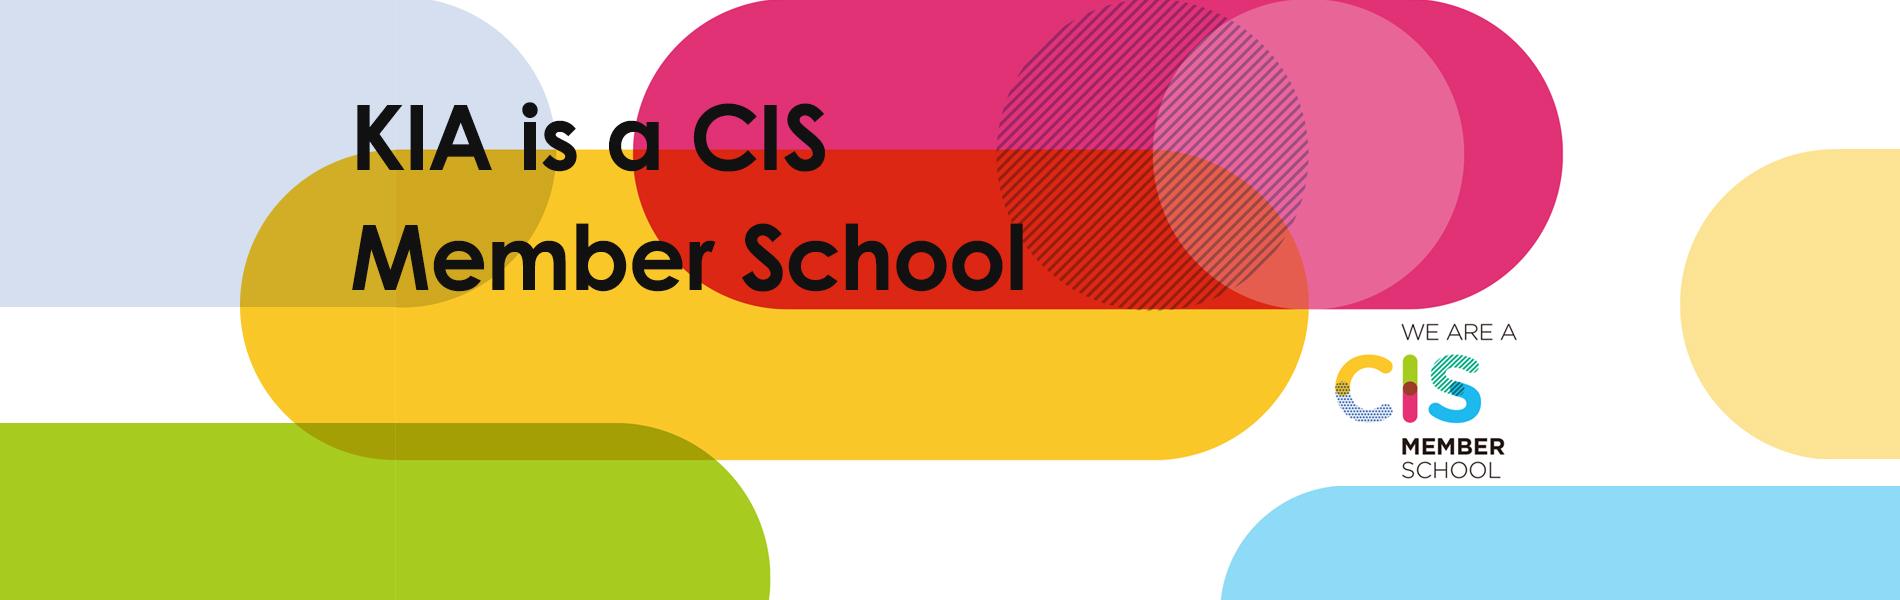 KIA is a CIS Member School